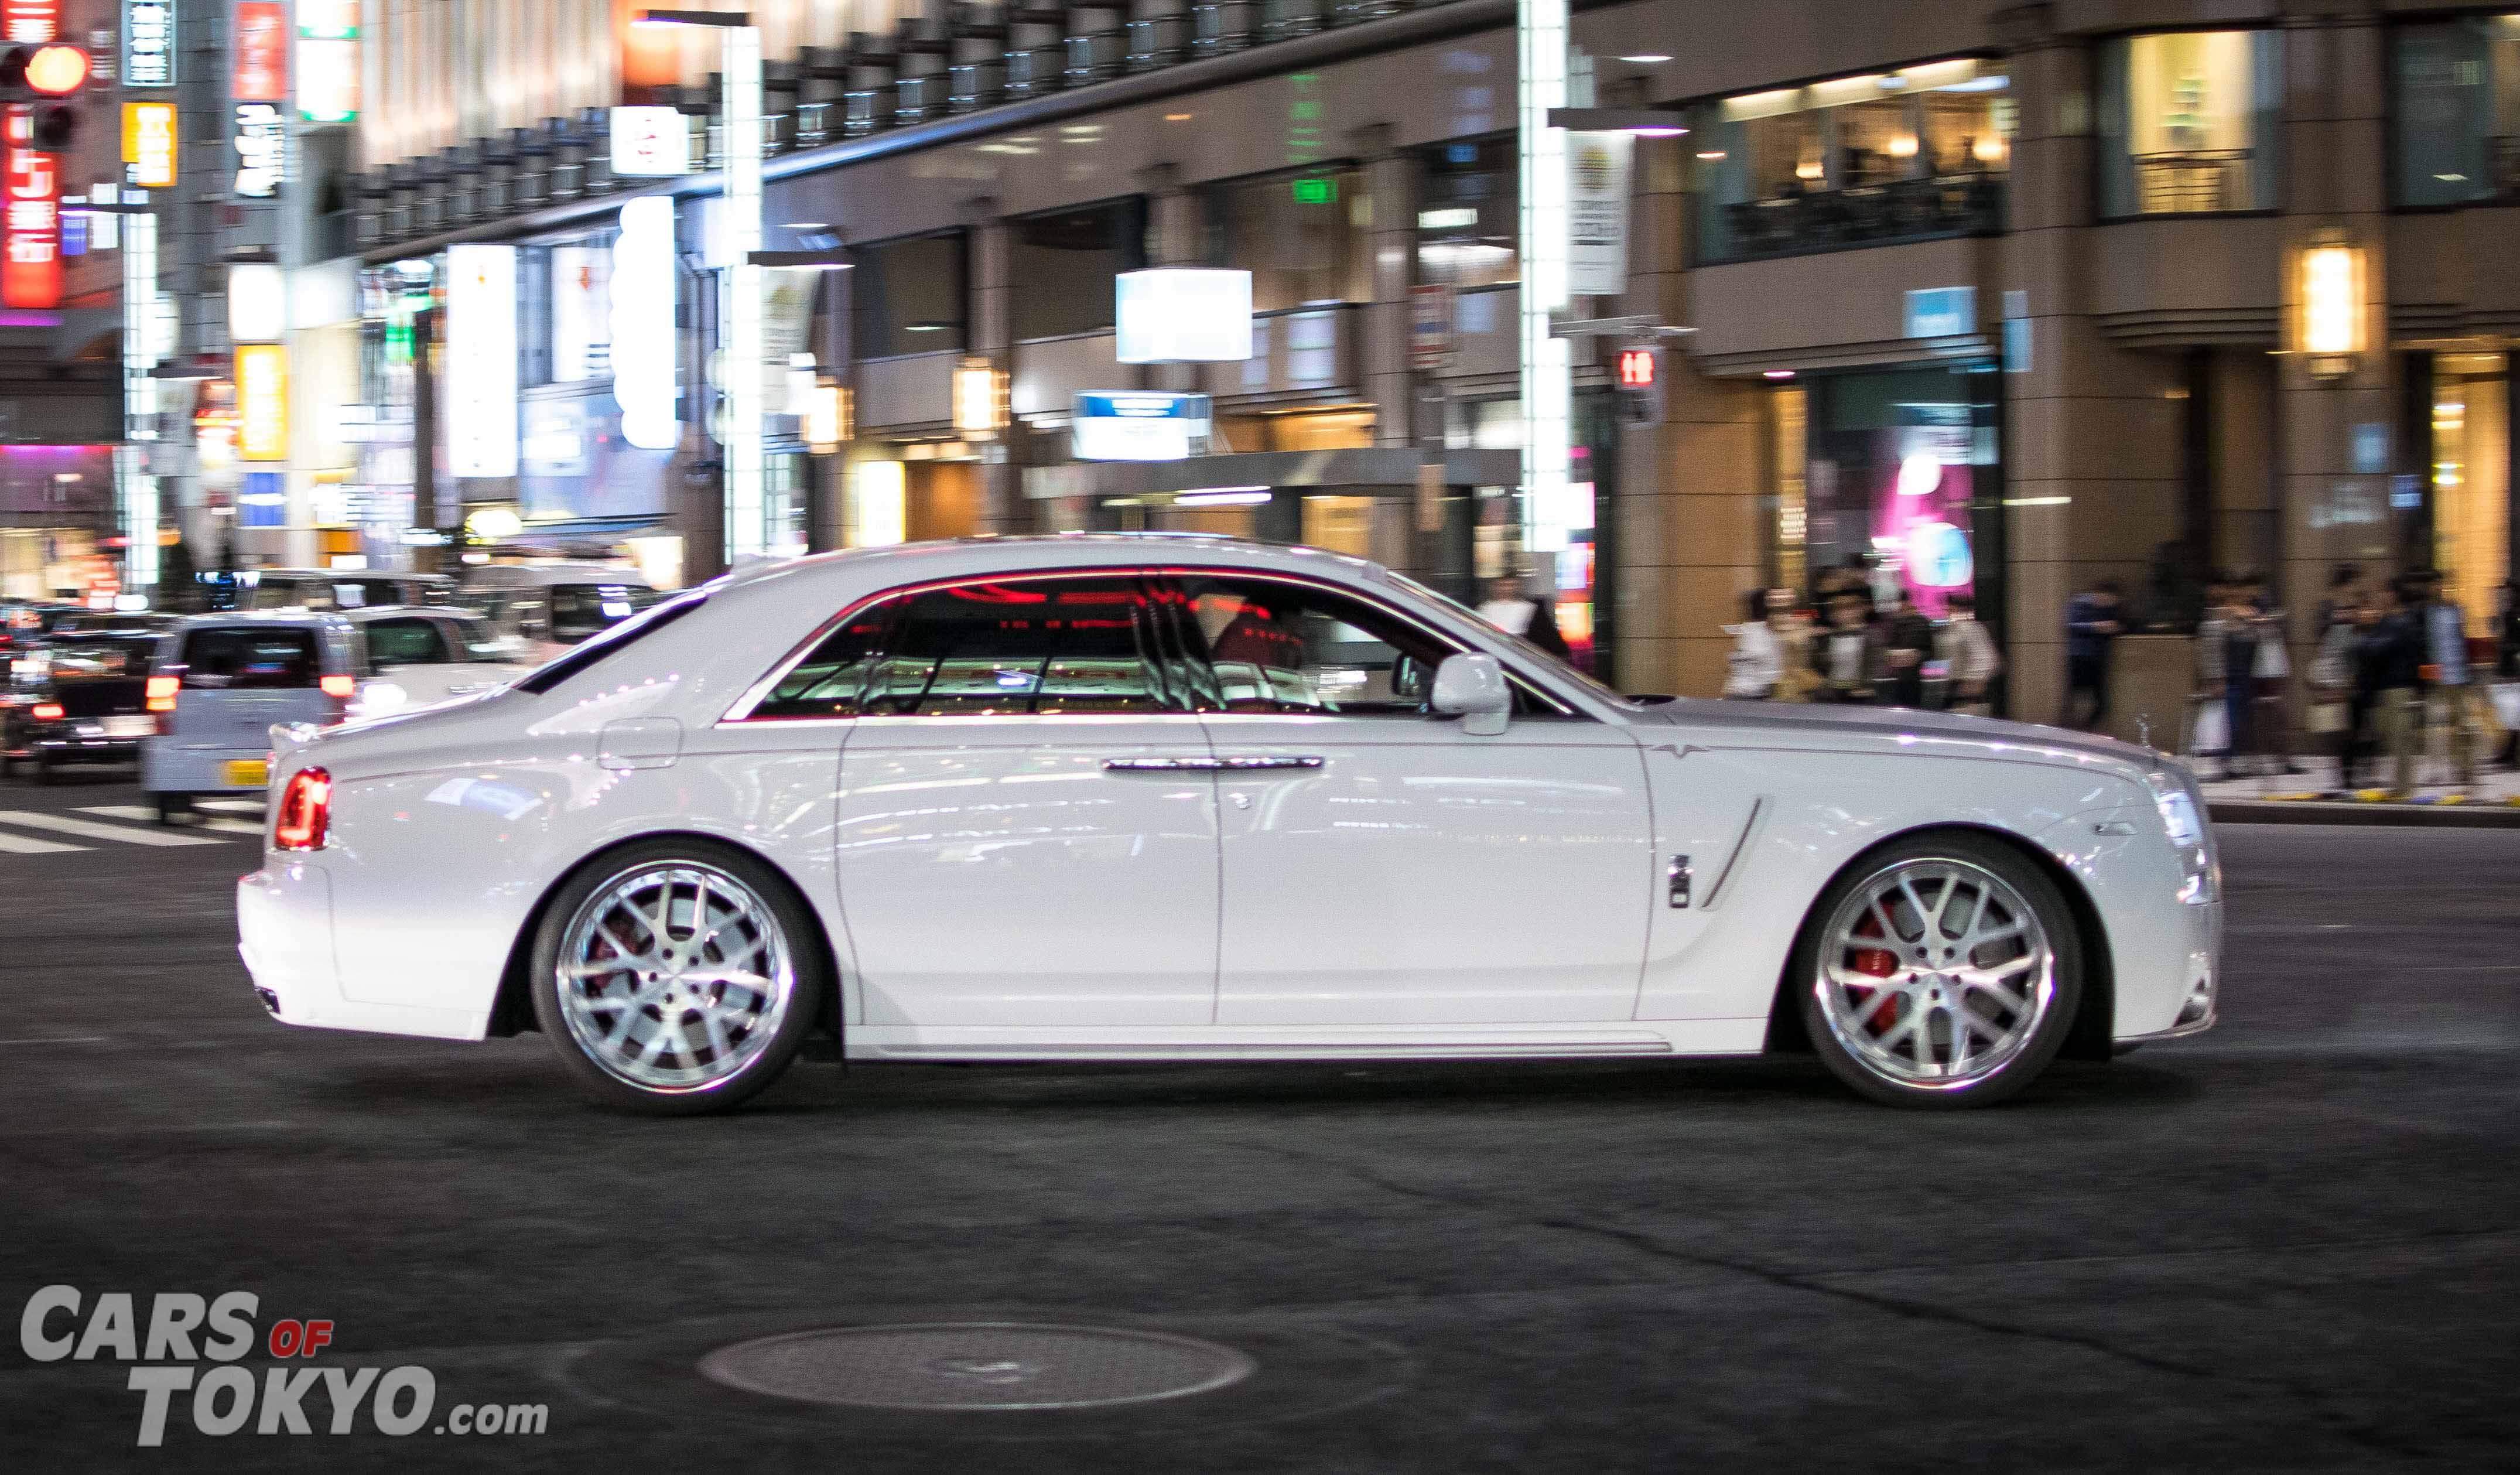 cars-of-tokyo-luxury-rolls-royce-ghost-ginza